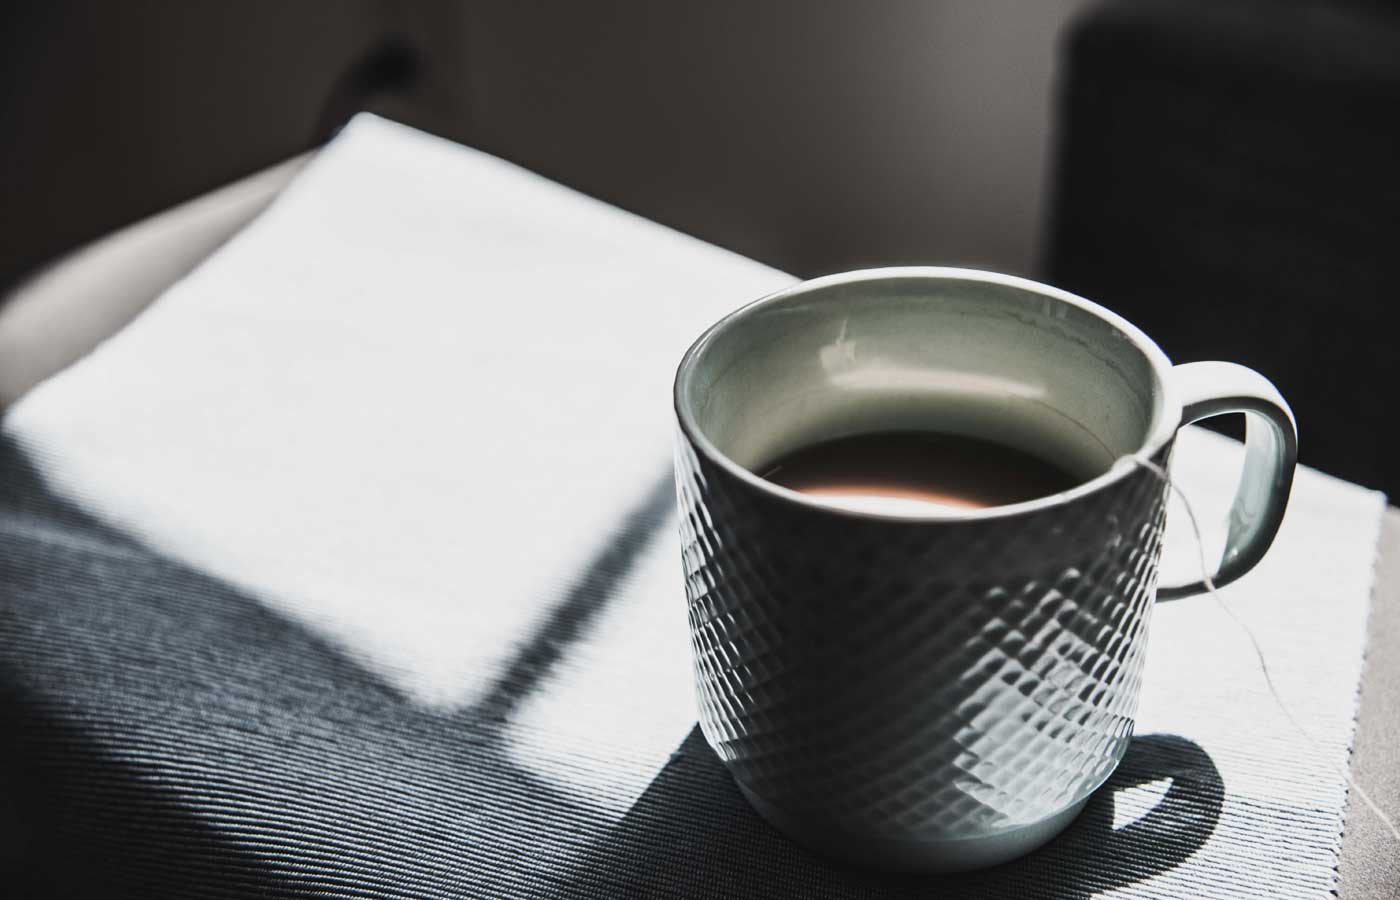 Native English copywriter - Shows a cup of English tea